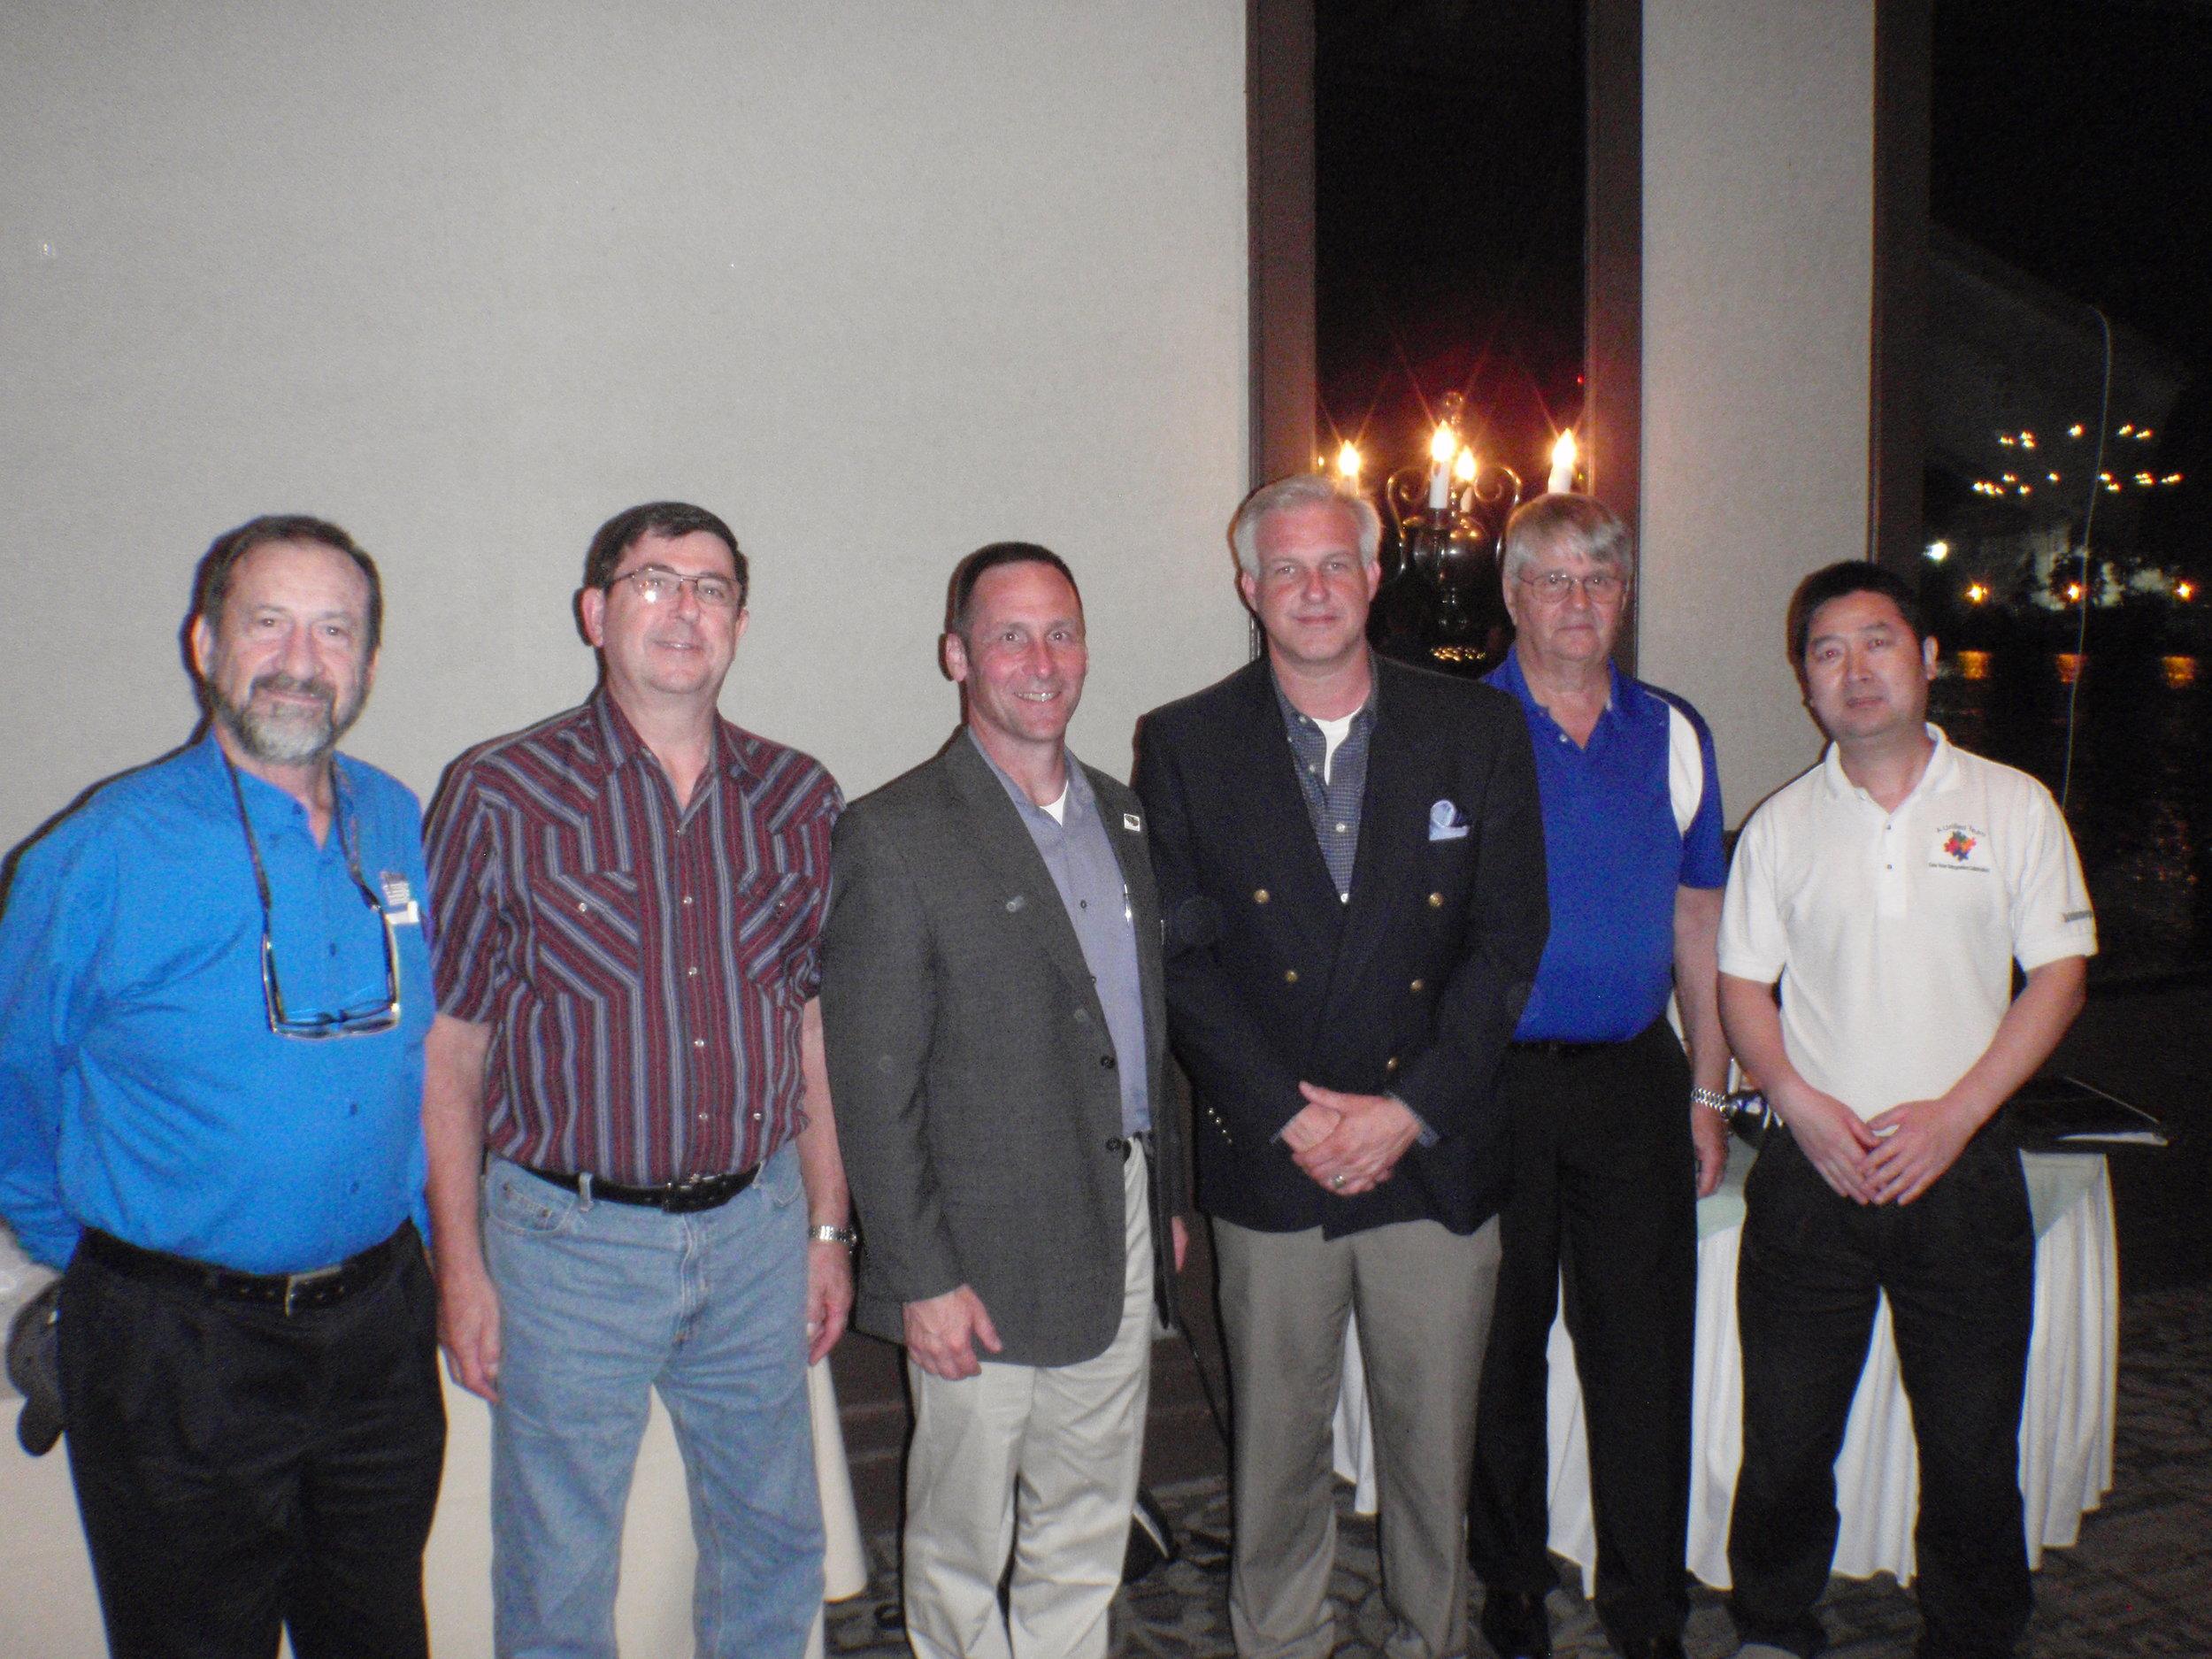 Past GHASNT Section Chairs: Syl Viaclovsky, Jerry Fulin, Jeff Wagner, John T. Iman, Joe Mackin, and John Chen